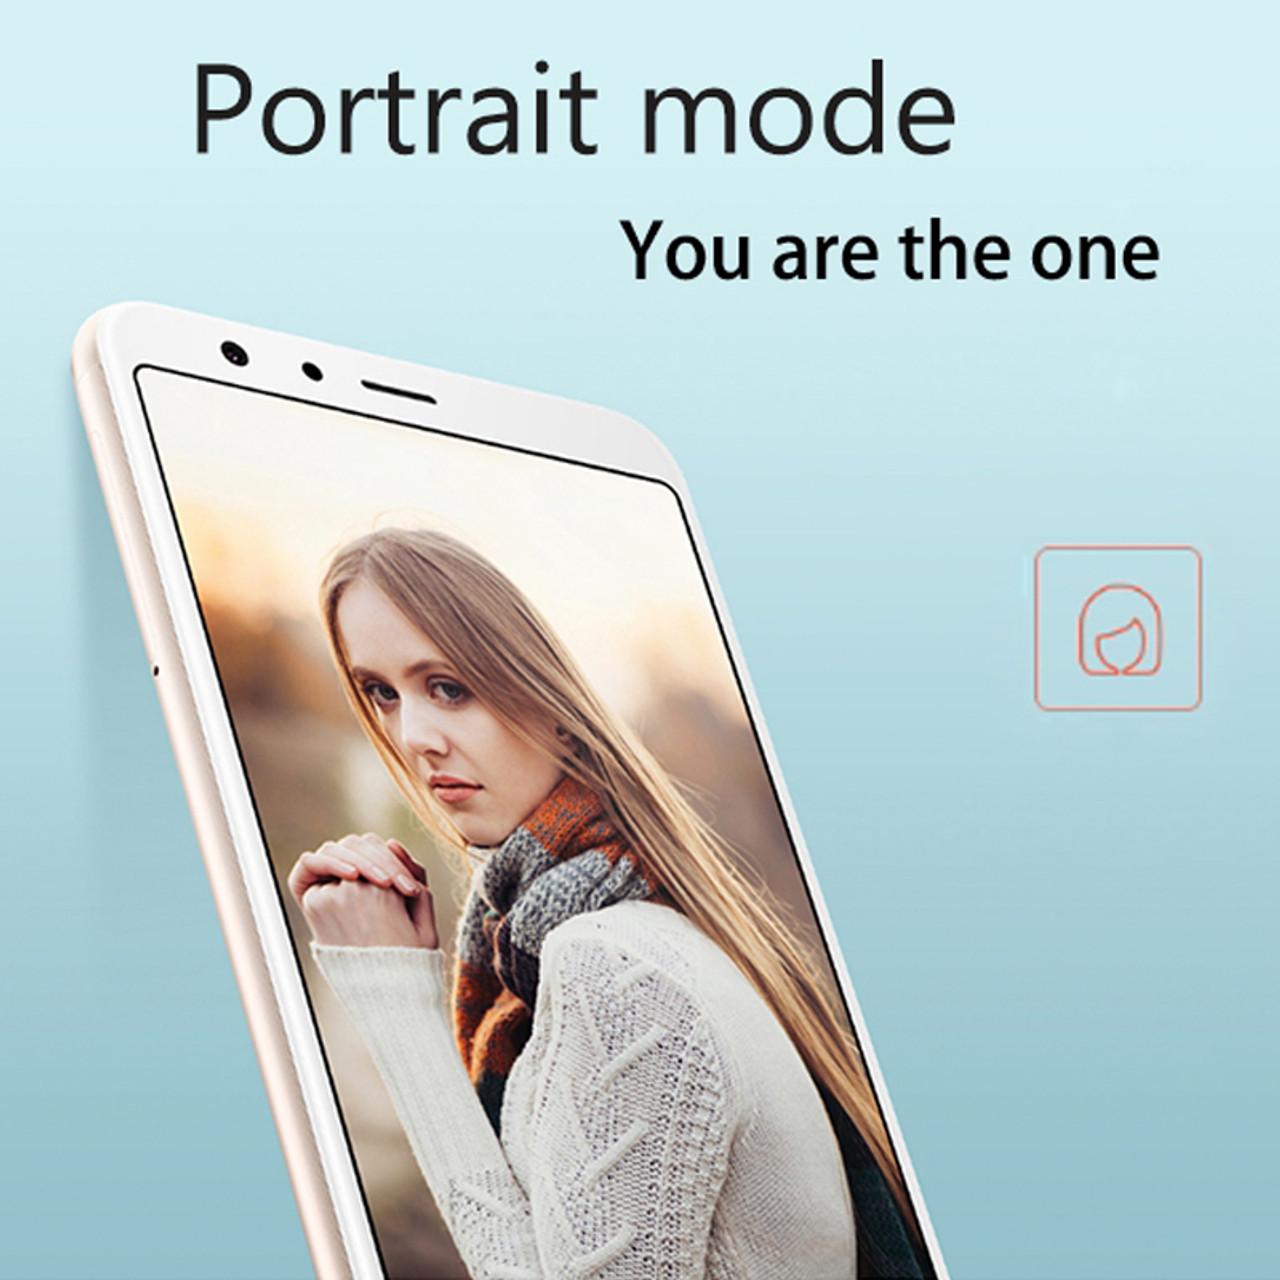 New Asus Zenfone Pegasus 4S Max Plus X018DC 4G RAM 32G ROM 5 7 inch Octa  Core 3 Cameras Android 7 0 4130mAh Smart Mobile Phone